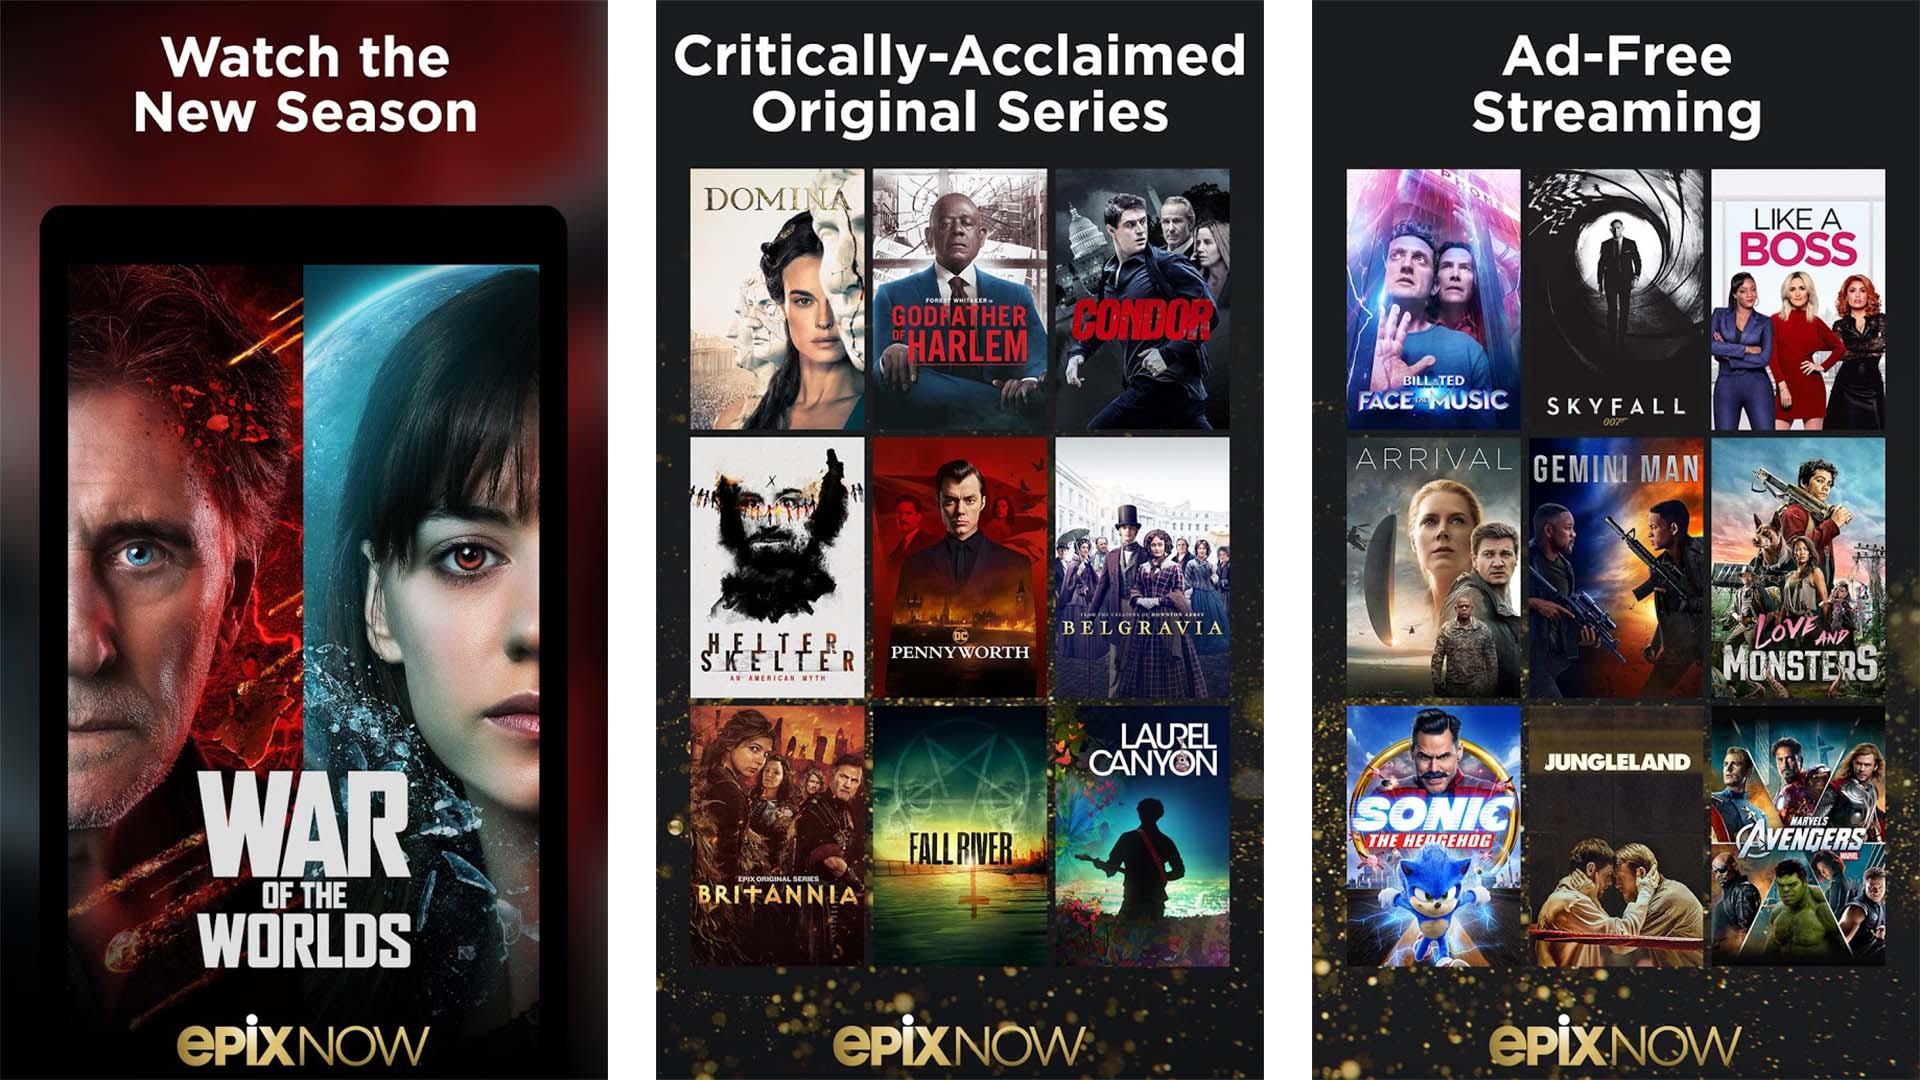 Epix Now screenshot 2021